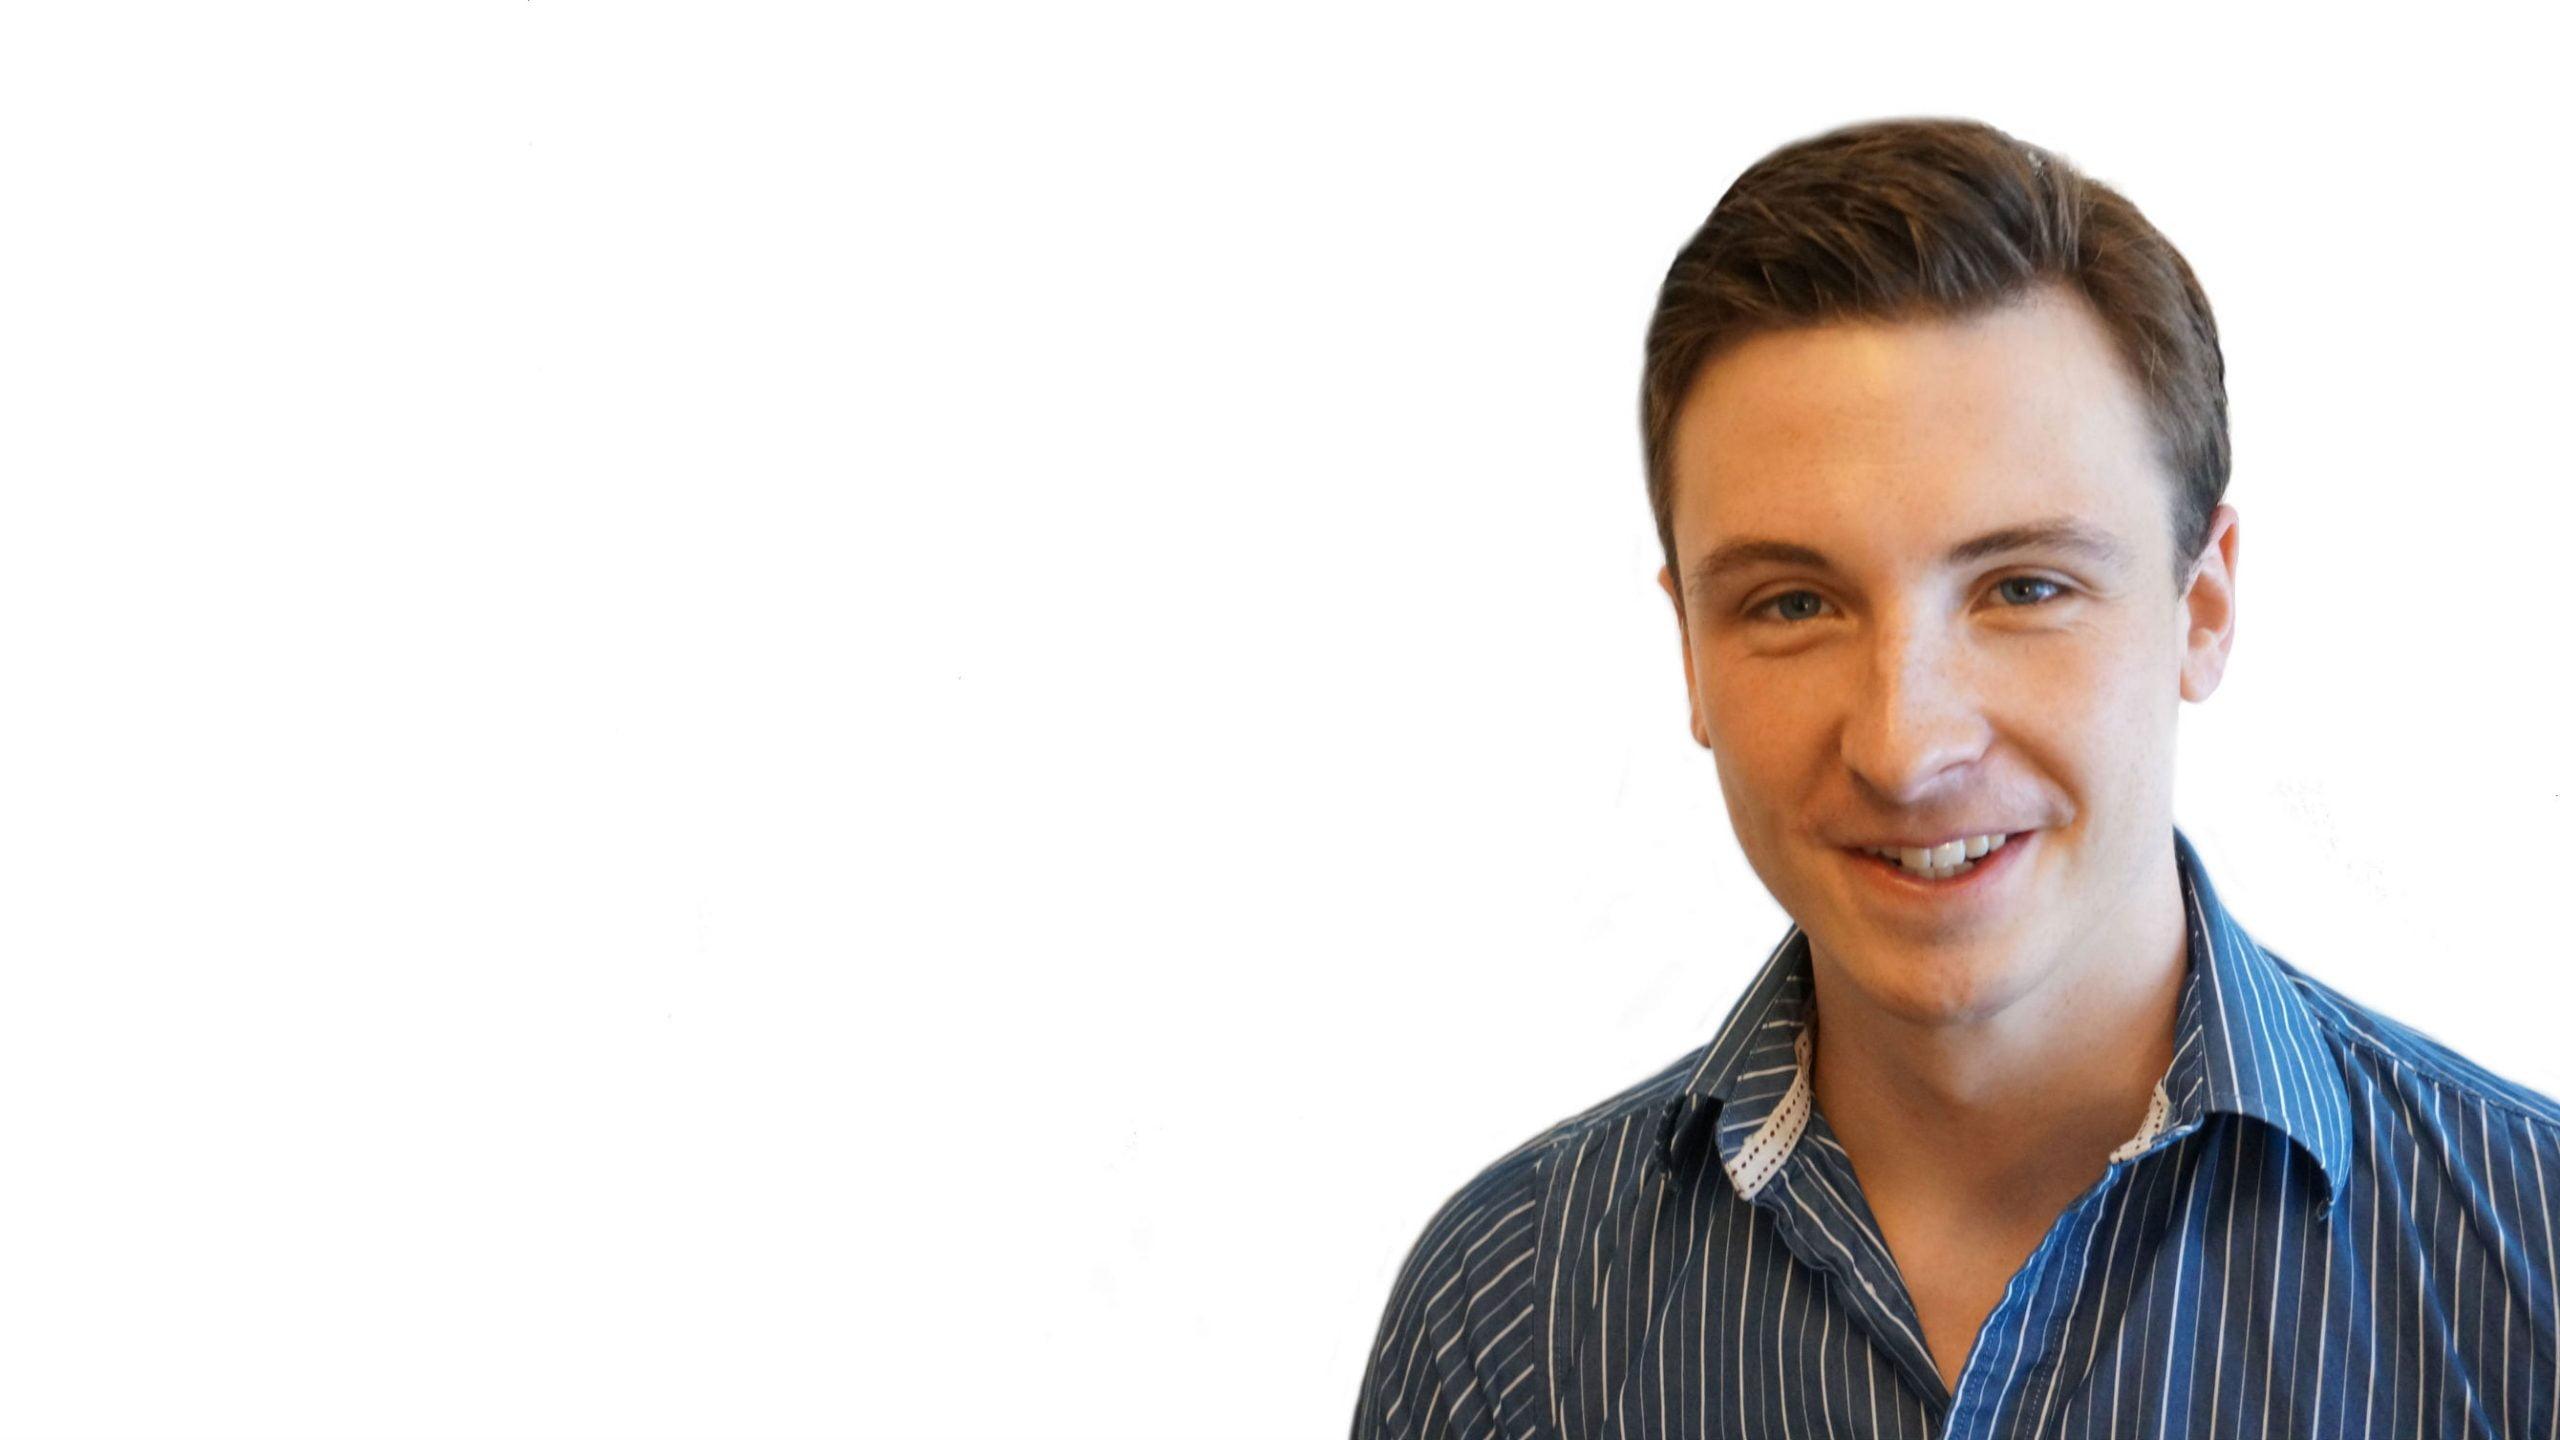 Chris Berrow Gaming Presenter and Commentator